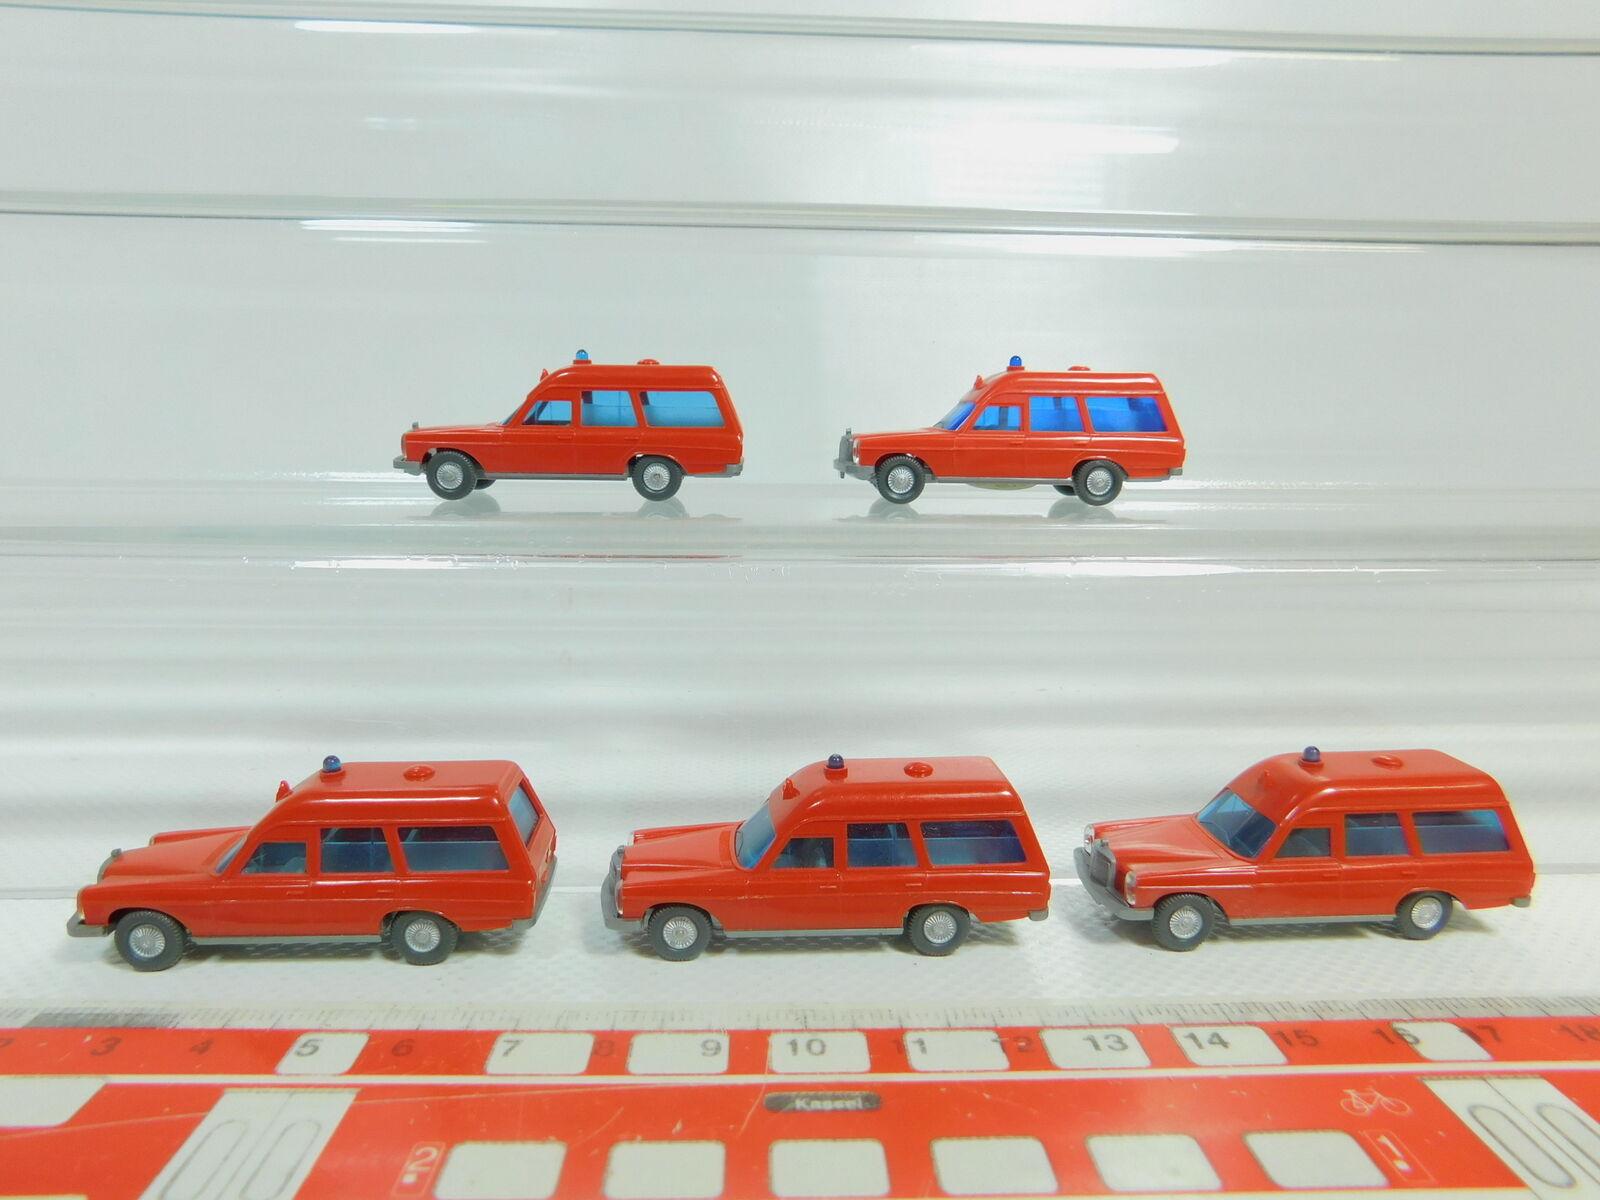 BO547-0,5 BO547-0,5 BO547-0,5 x Wiking H0 1 87 607 Ambulanza Mercedes   MB 200 Fw   Pompieri, S.G 890f68